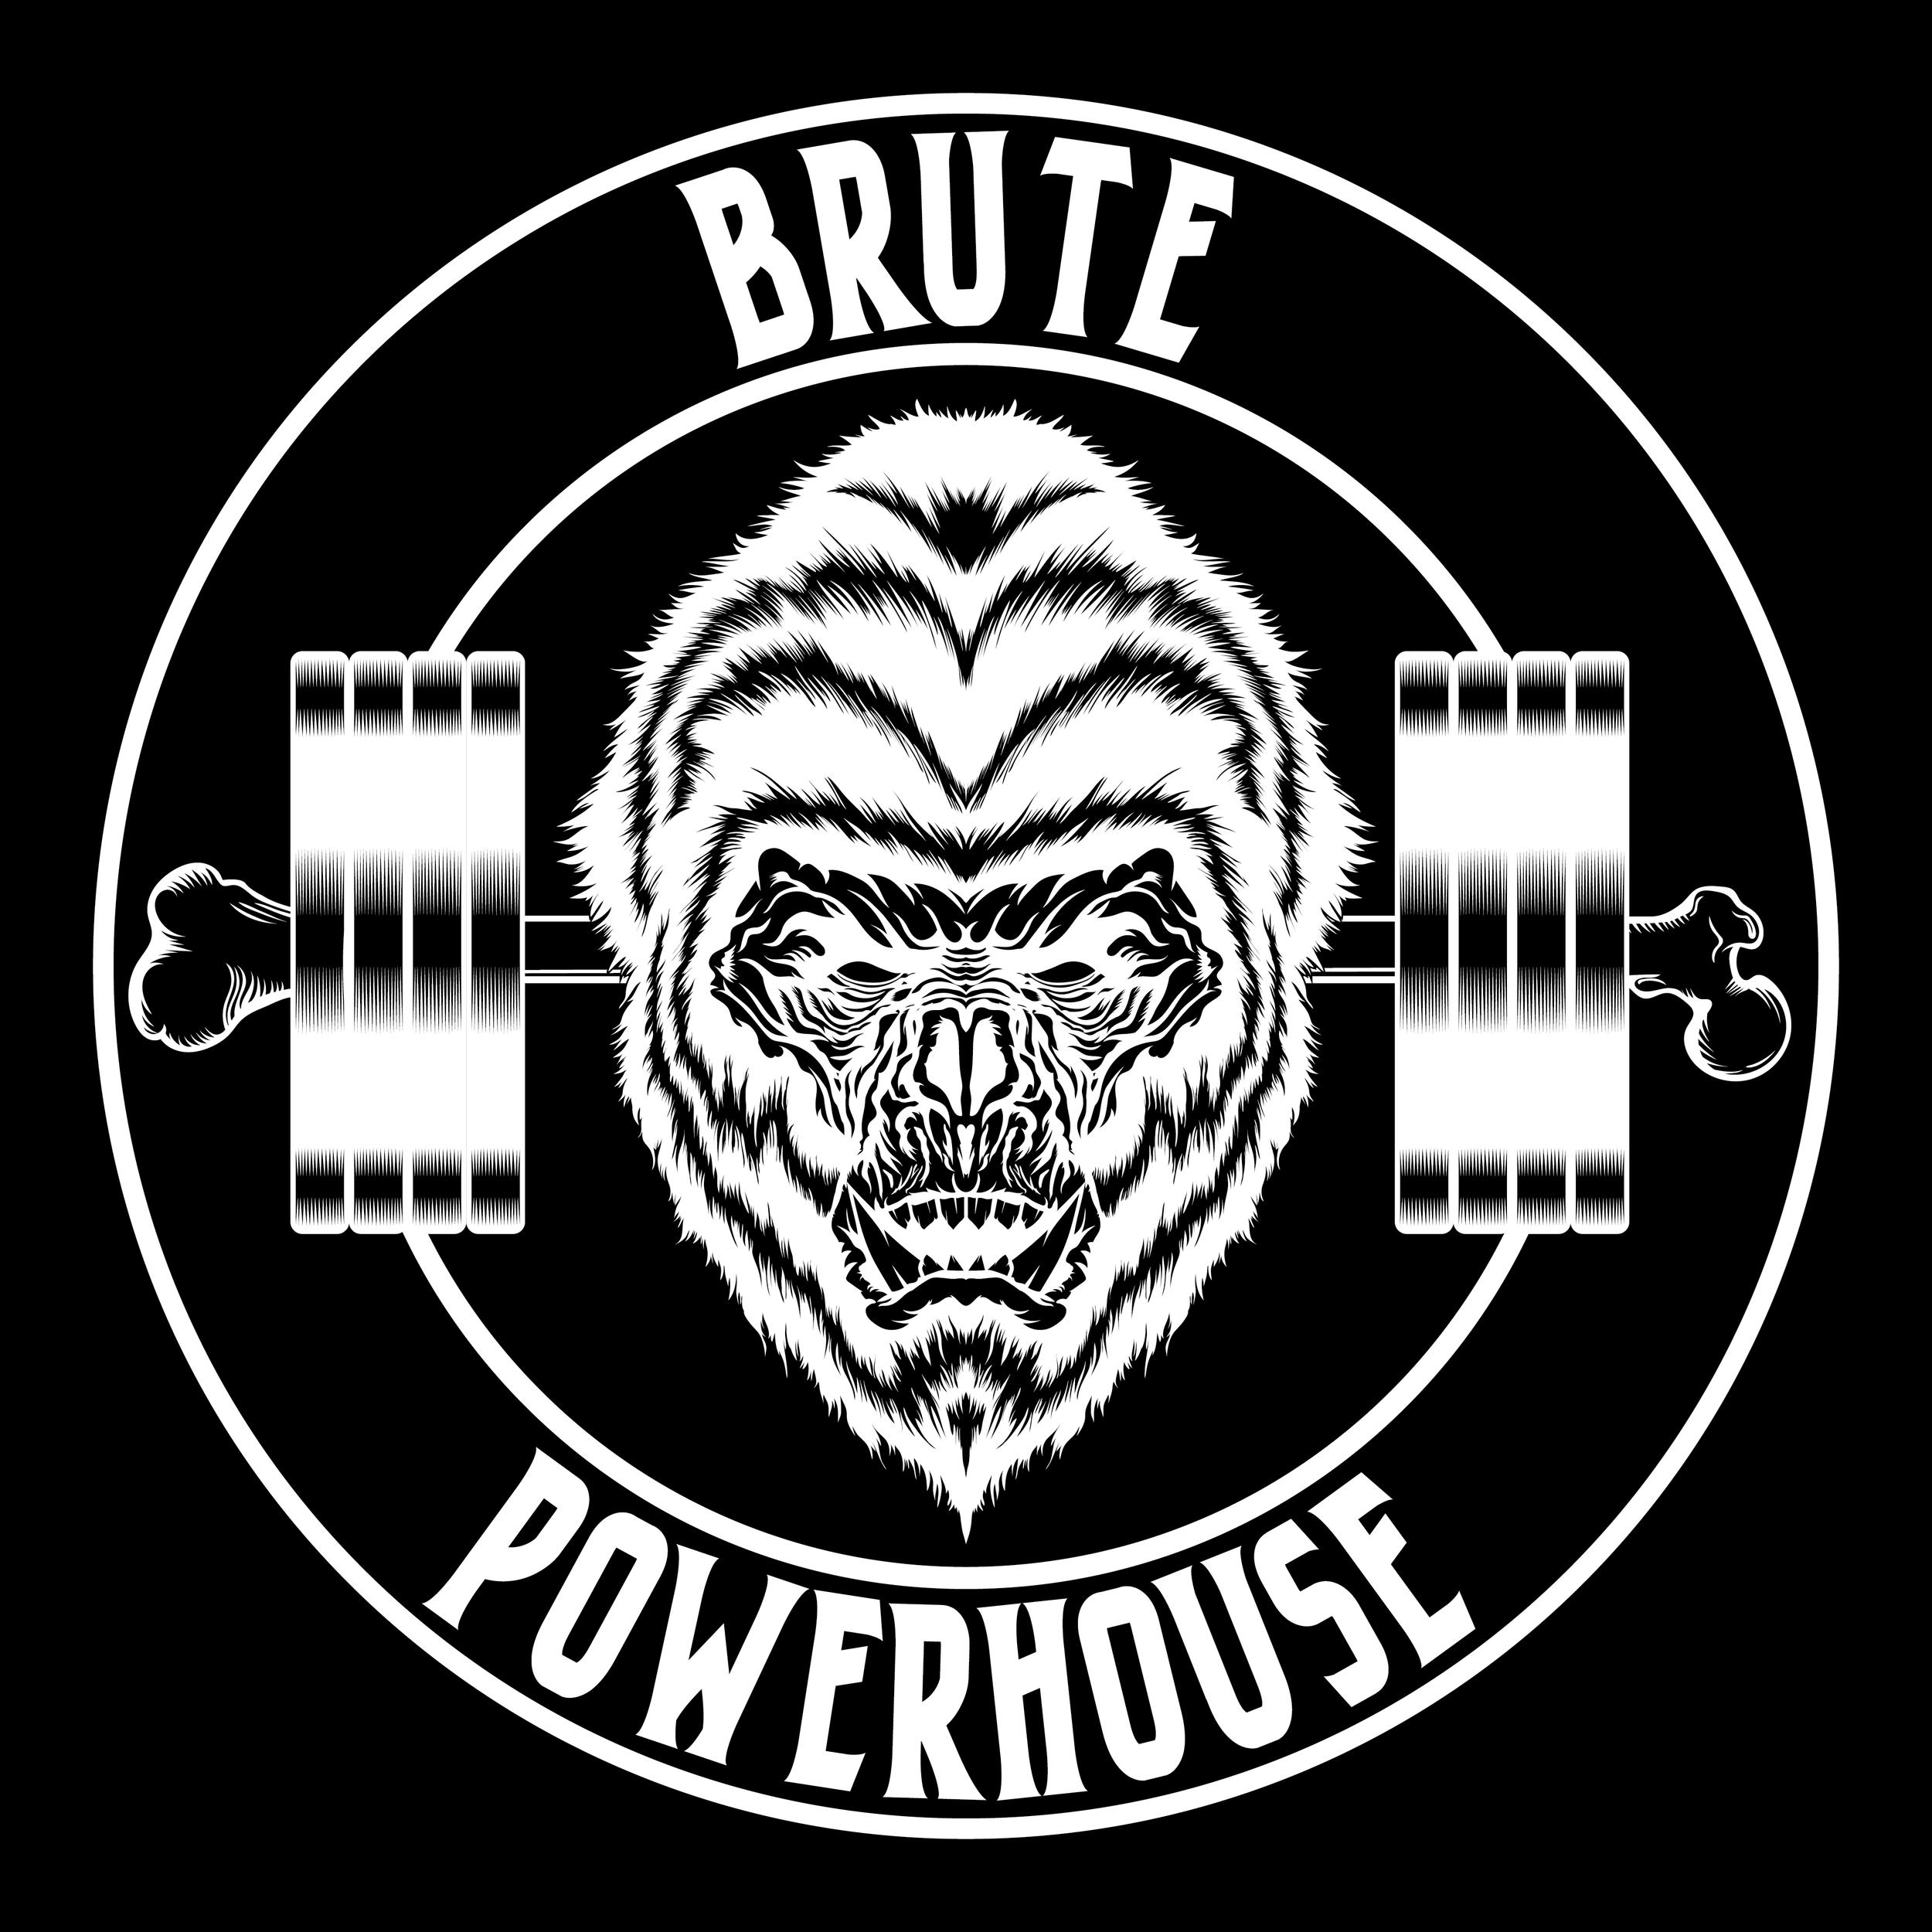 brute-powerhouse-illustration-logo-adobe-illustrator-vector-art-artist-gorilla-monster-ape-savage-gym-crossfit-powerlifting-roberto-orozco-design-graphic-designer-black-white-circle-v3.jpg